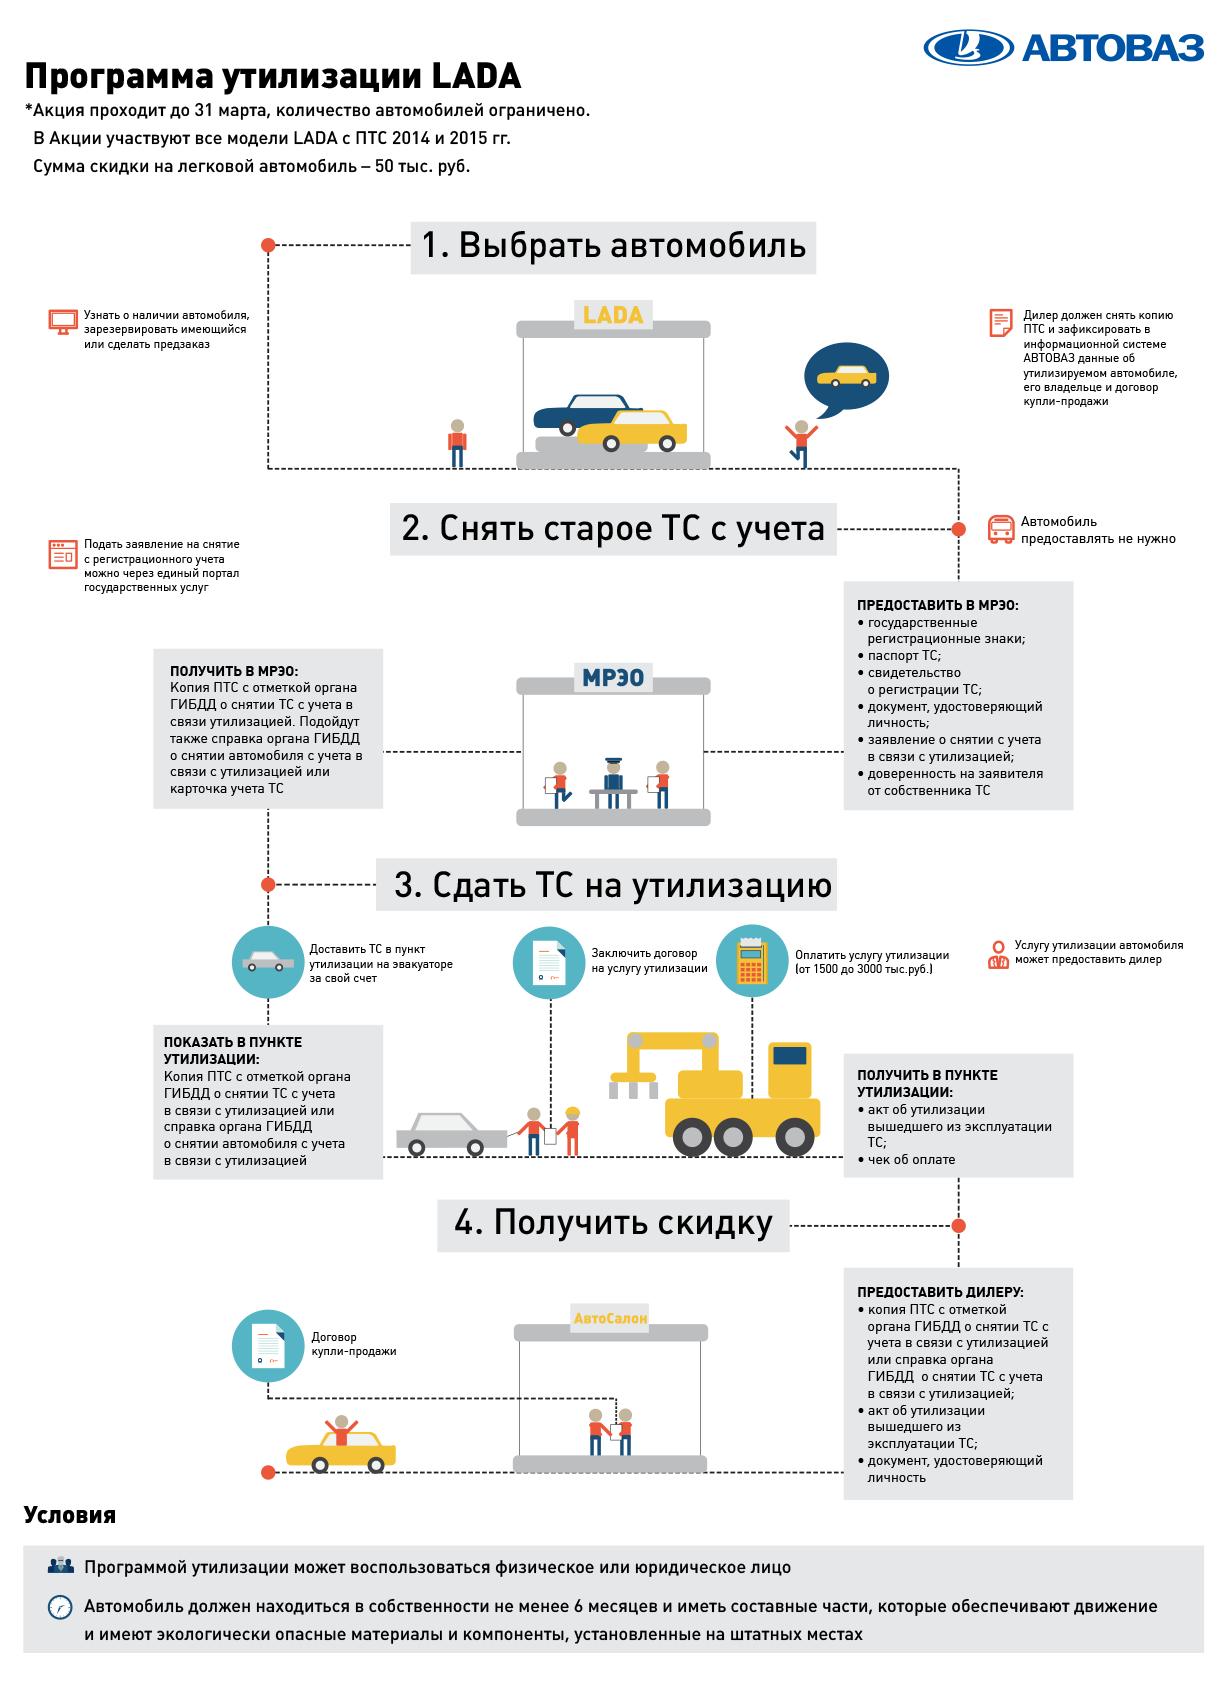 Программа утилизации автомобилей 2015